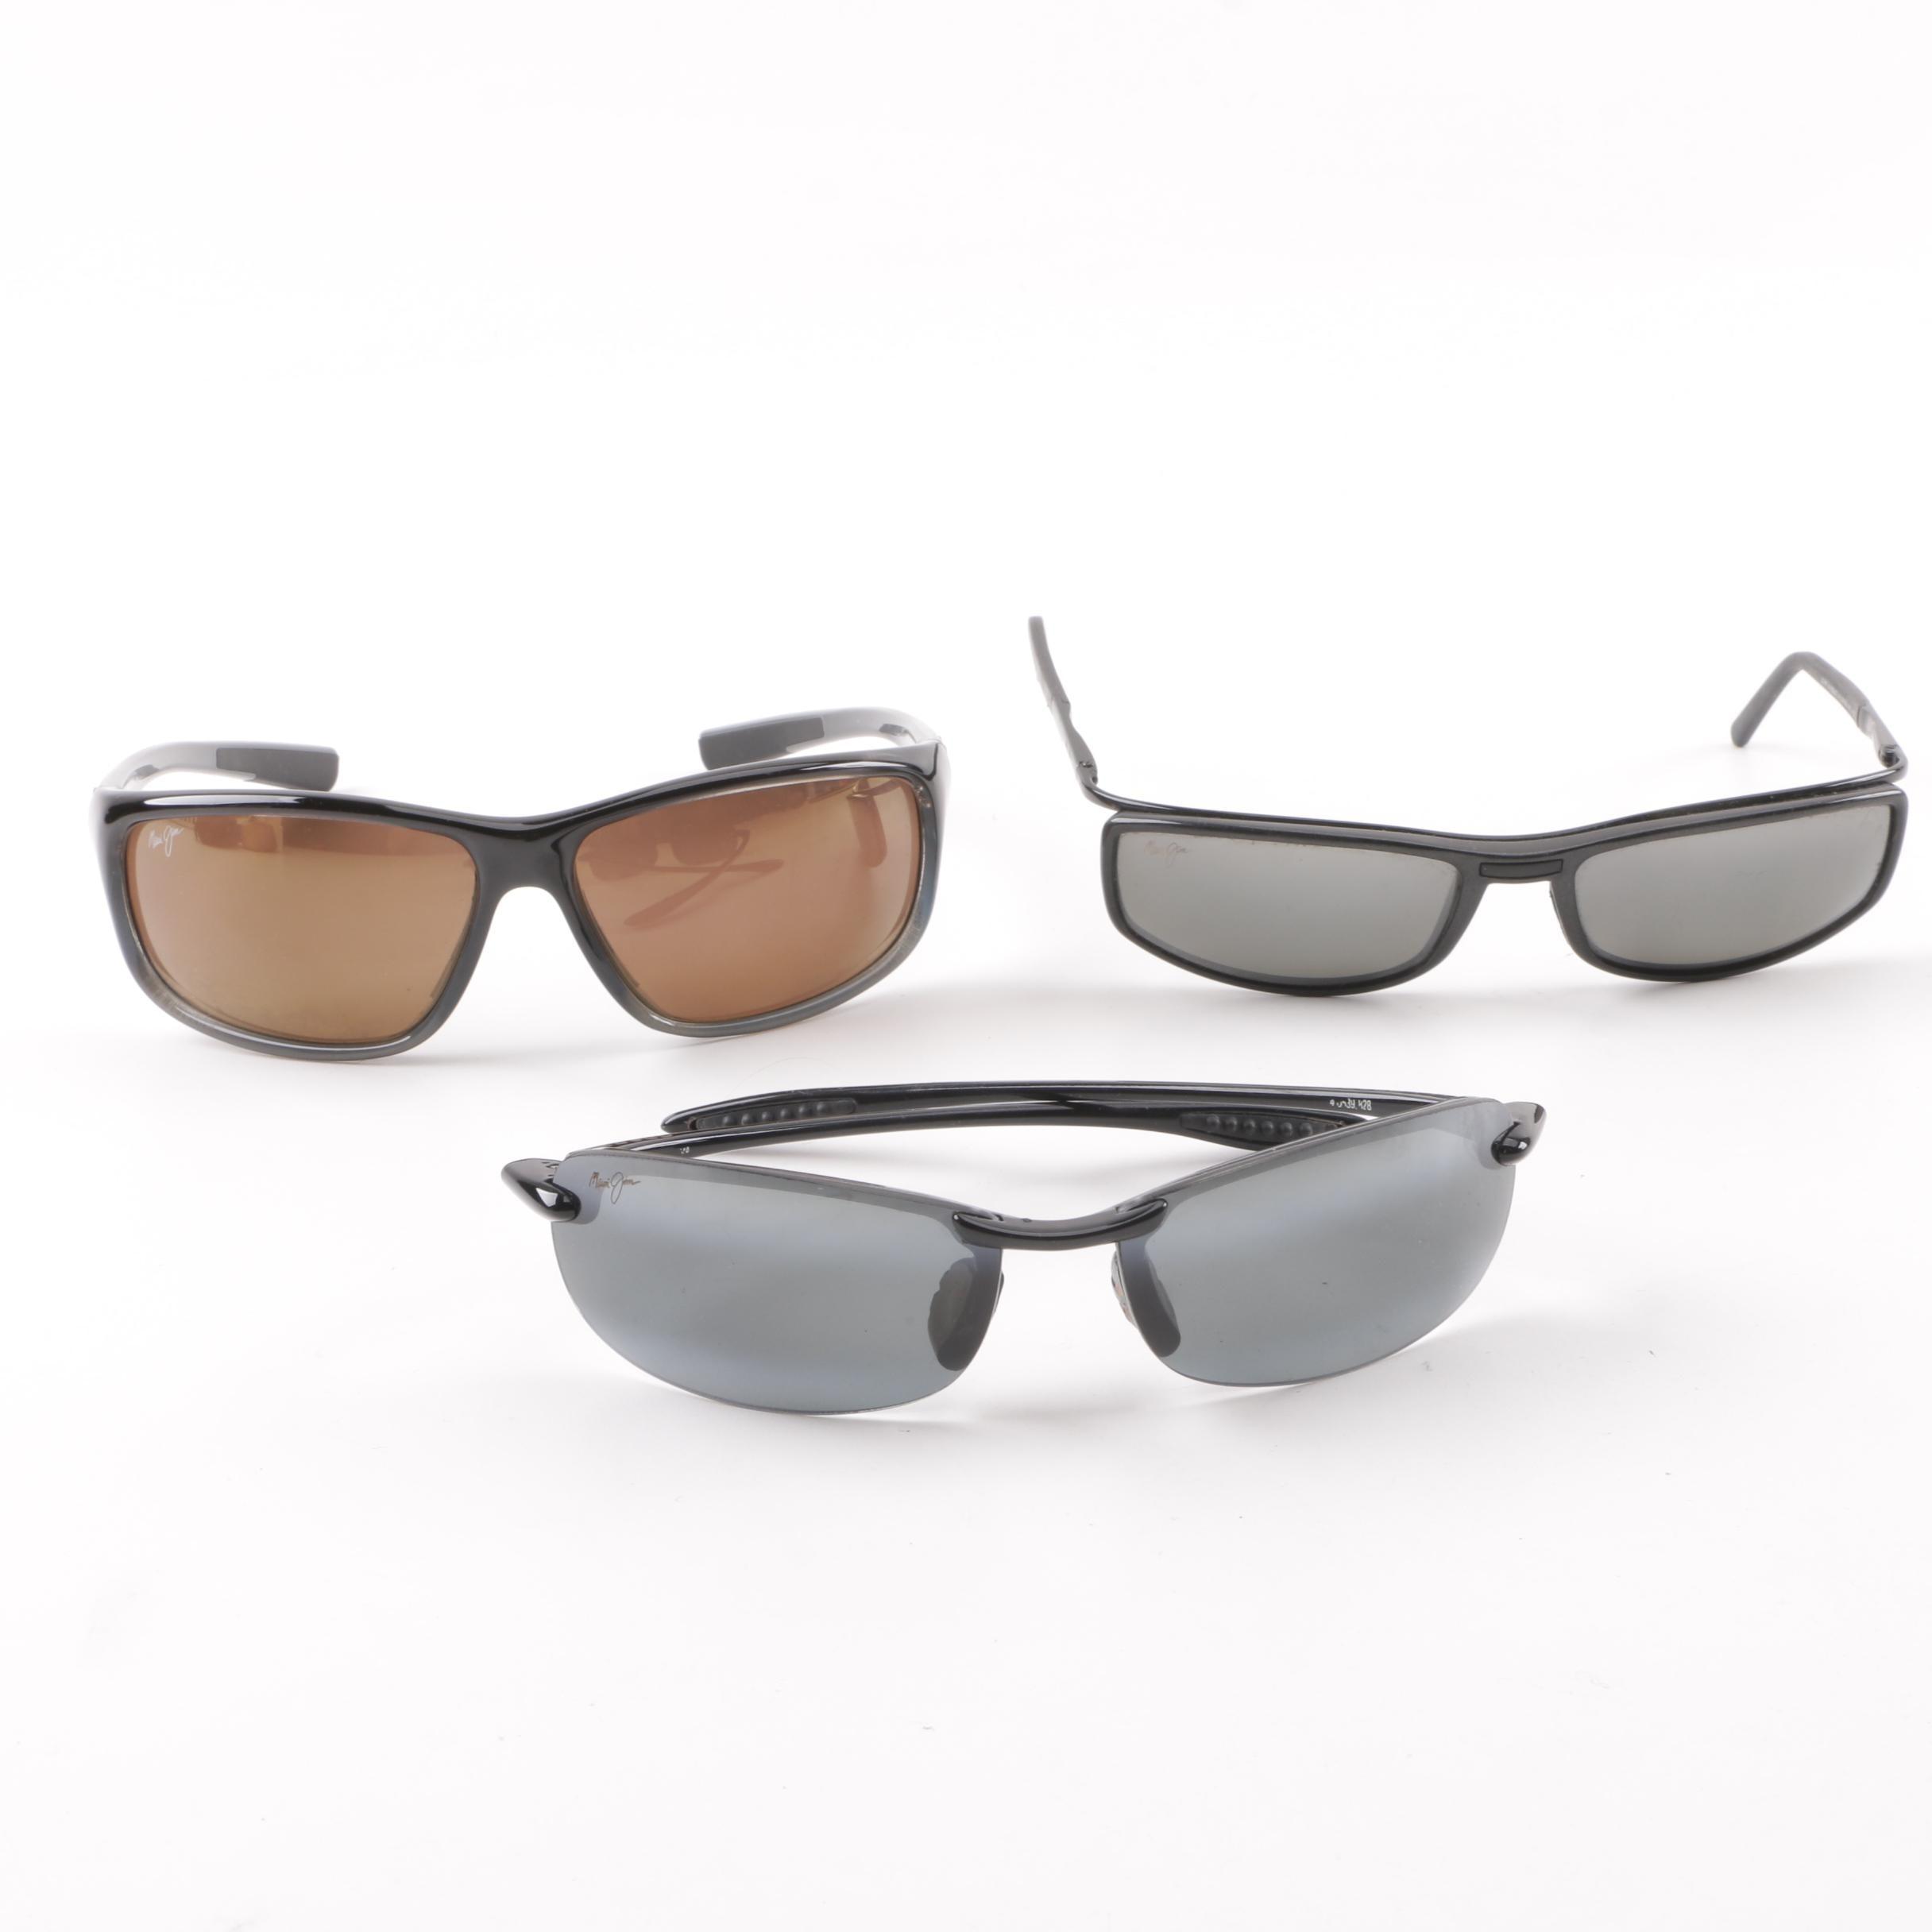 Maui Jim Sunglasses including MJ113-02 Mirage